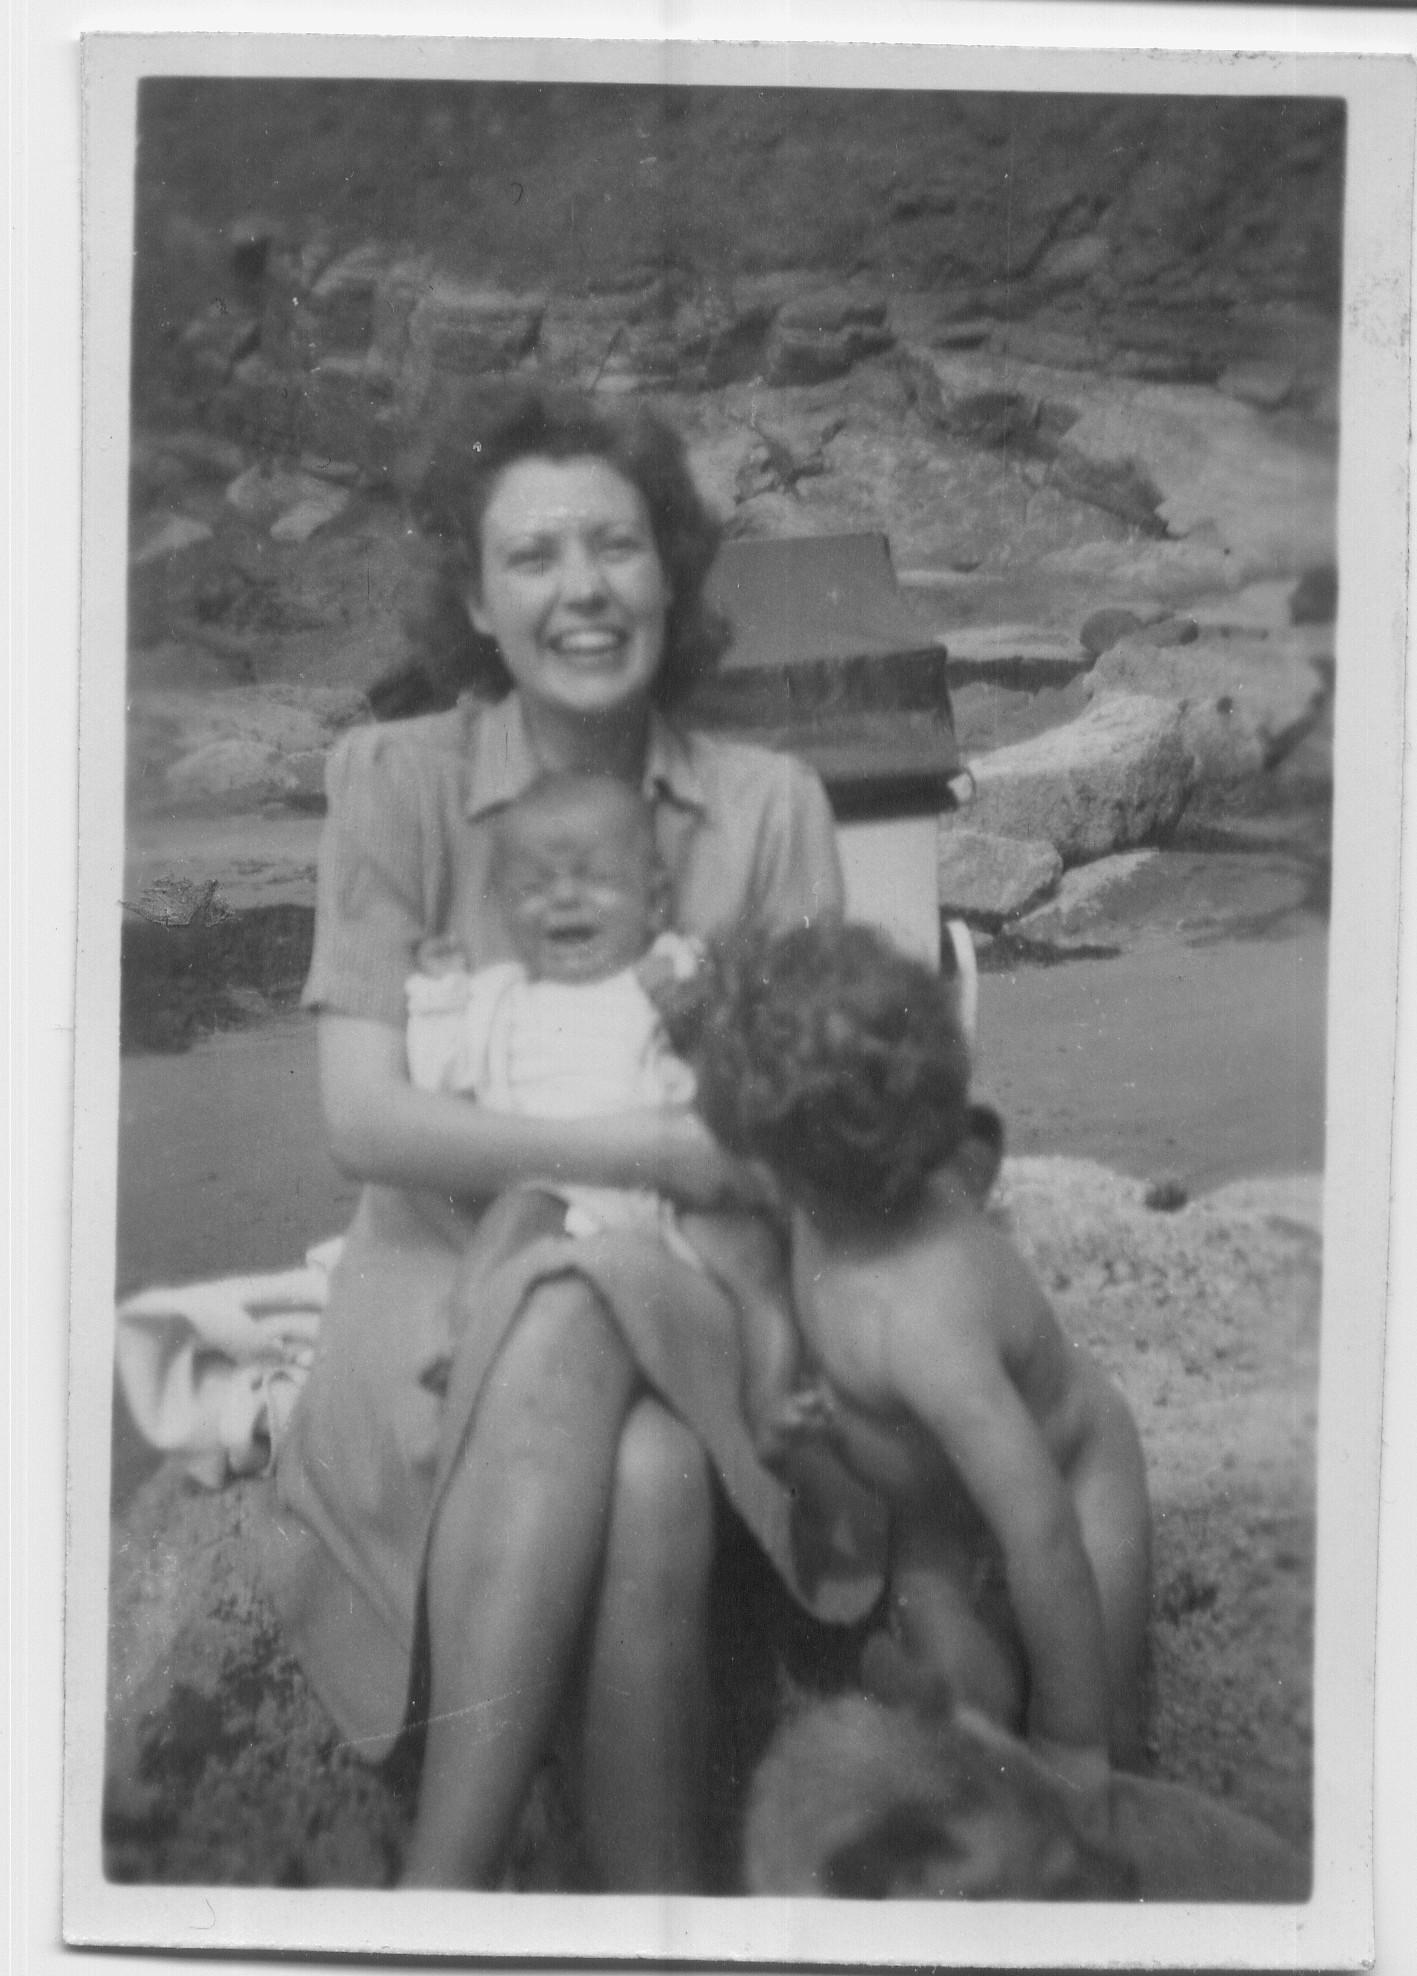 1945 Jossie Jay Michael Nolton